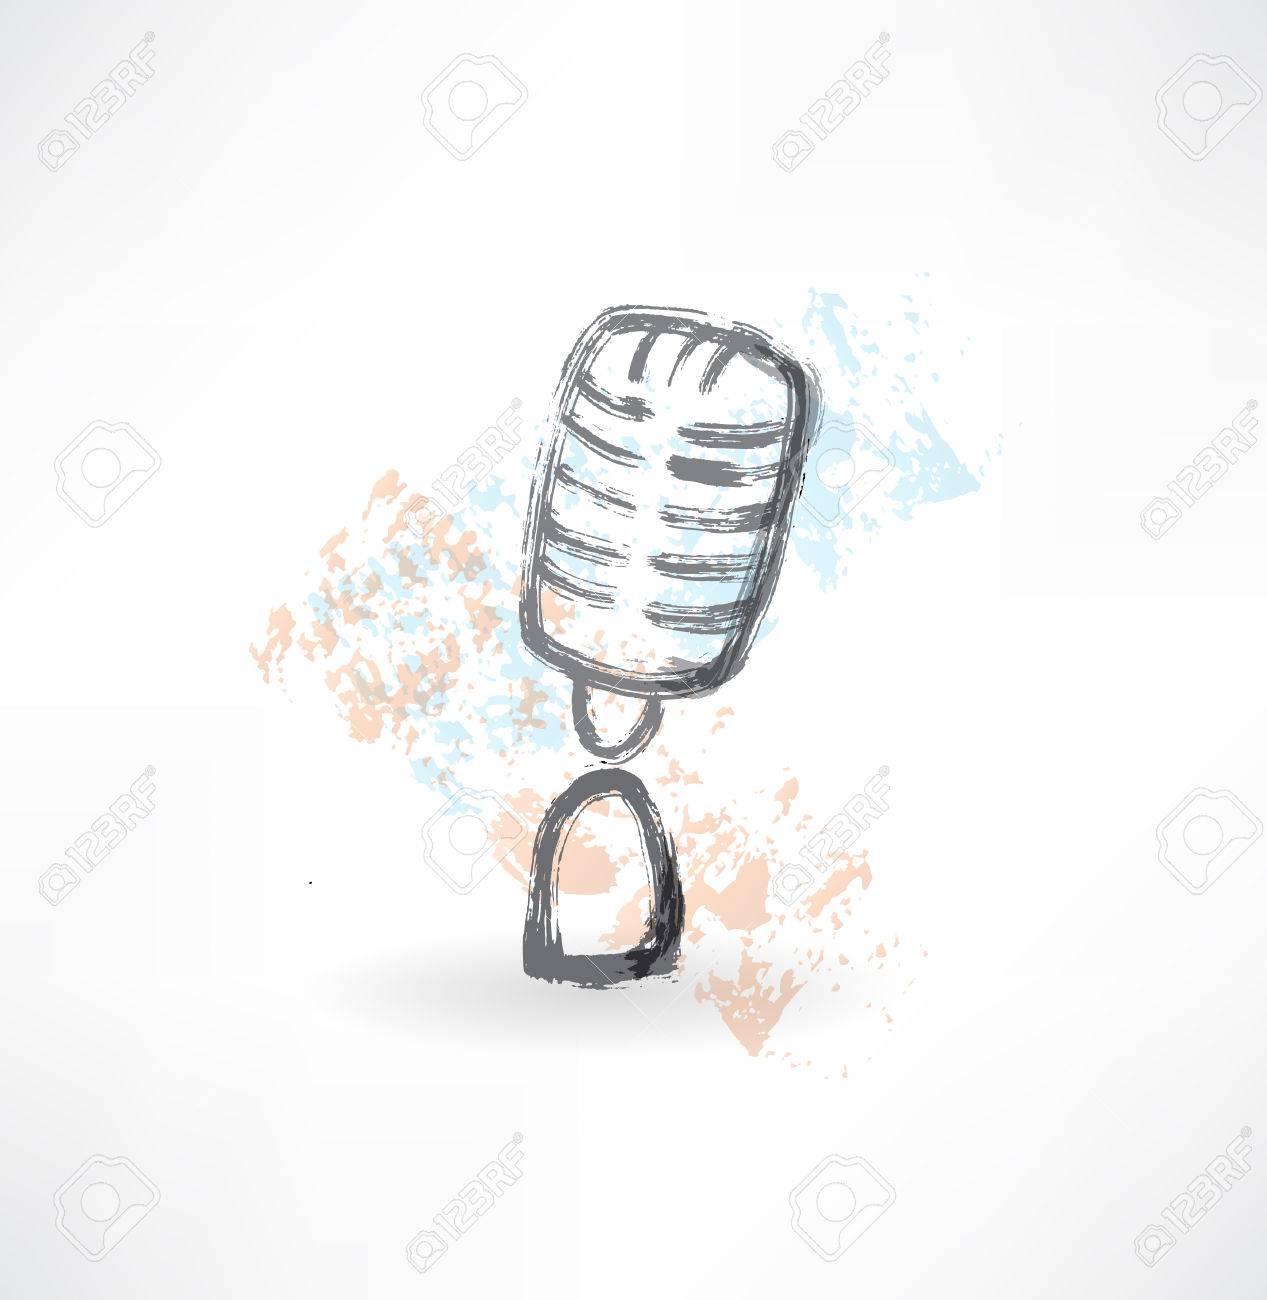 Grunge Icono Del Micrófono De Dibujos Animados